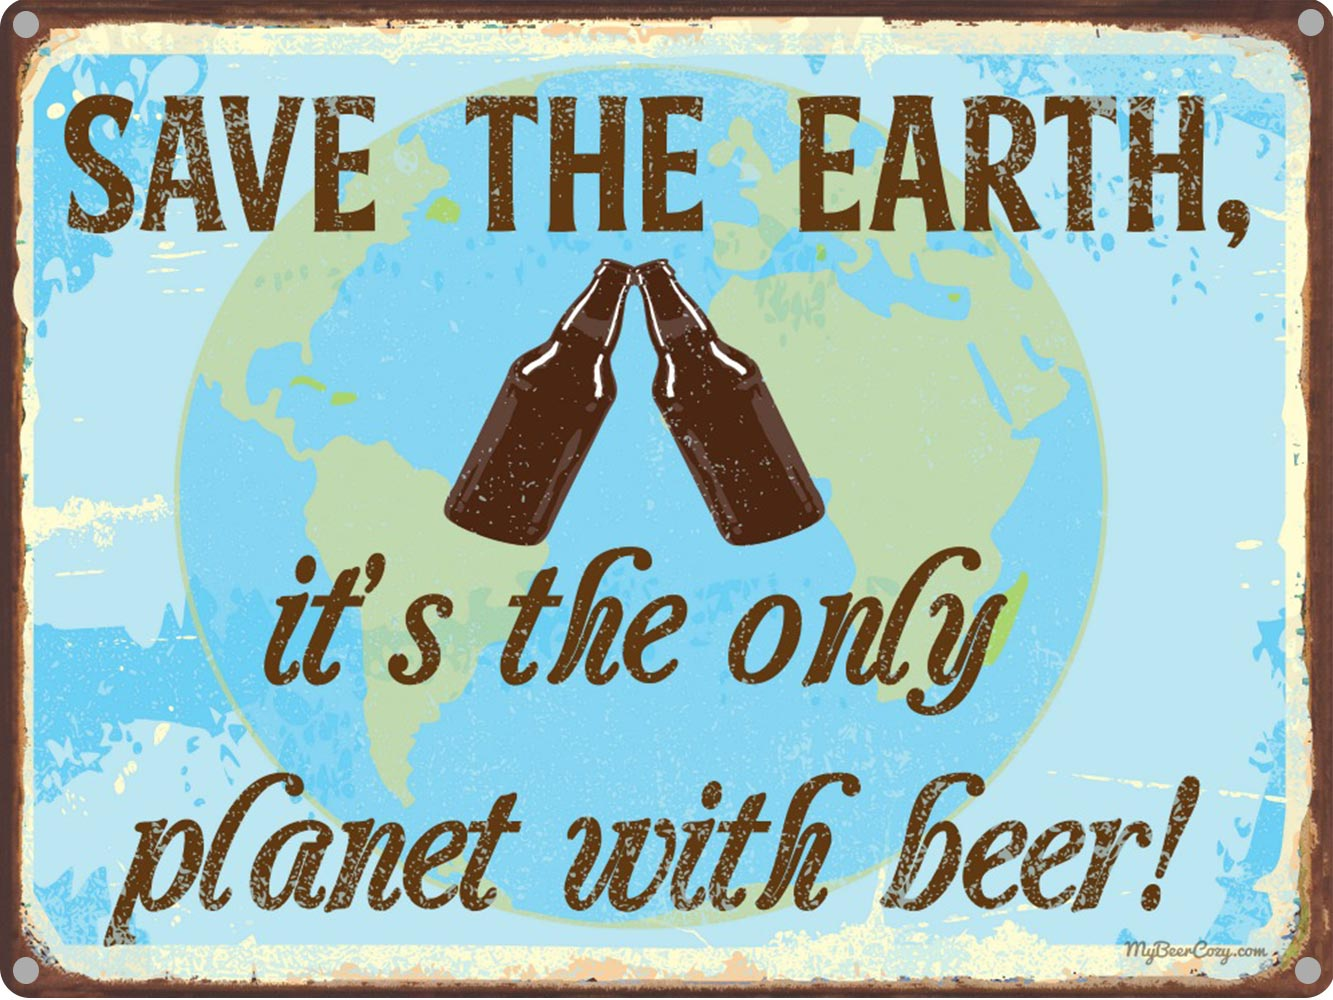 Pivo, pivko, pivečko